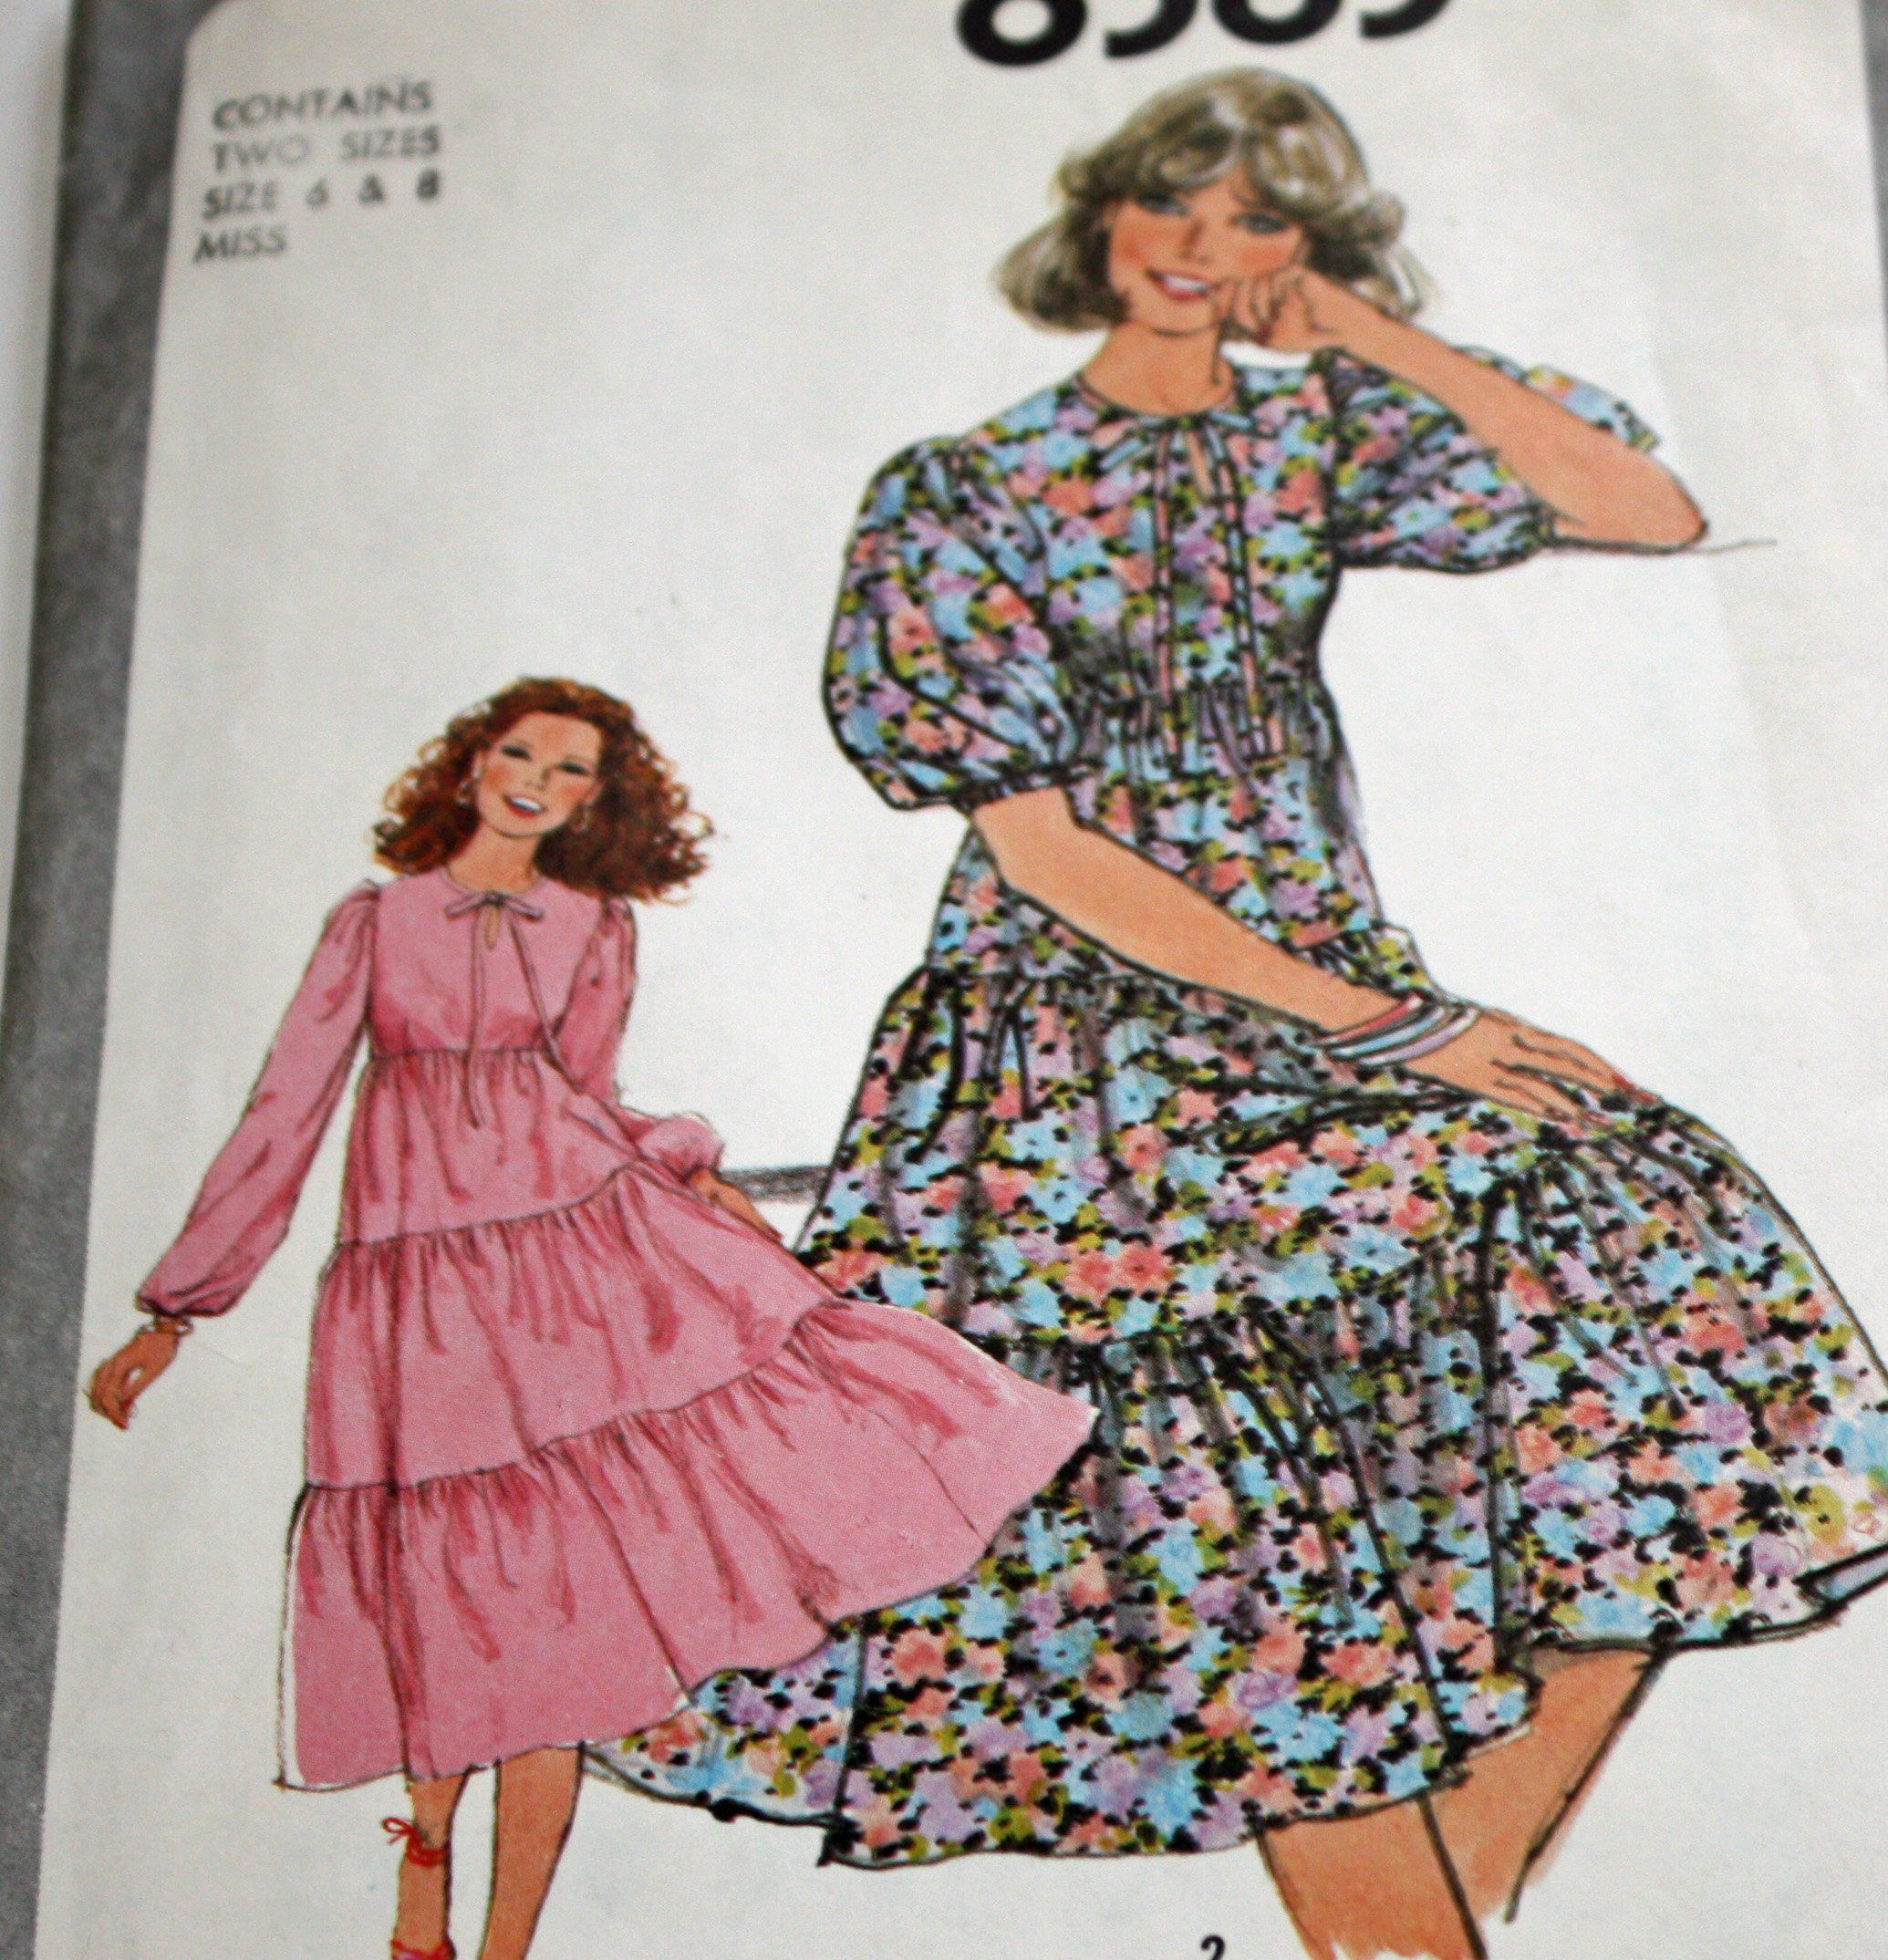 Vintage 1970s Sewing Pattern Simplicity 8383 Misses Etsy 1970s Sewing Patterns Sewing Patterns Simplicity Sewing Patterns